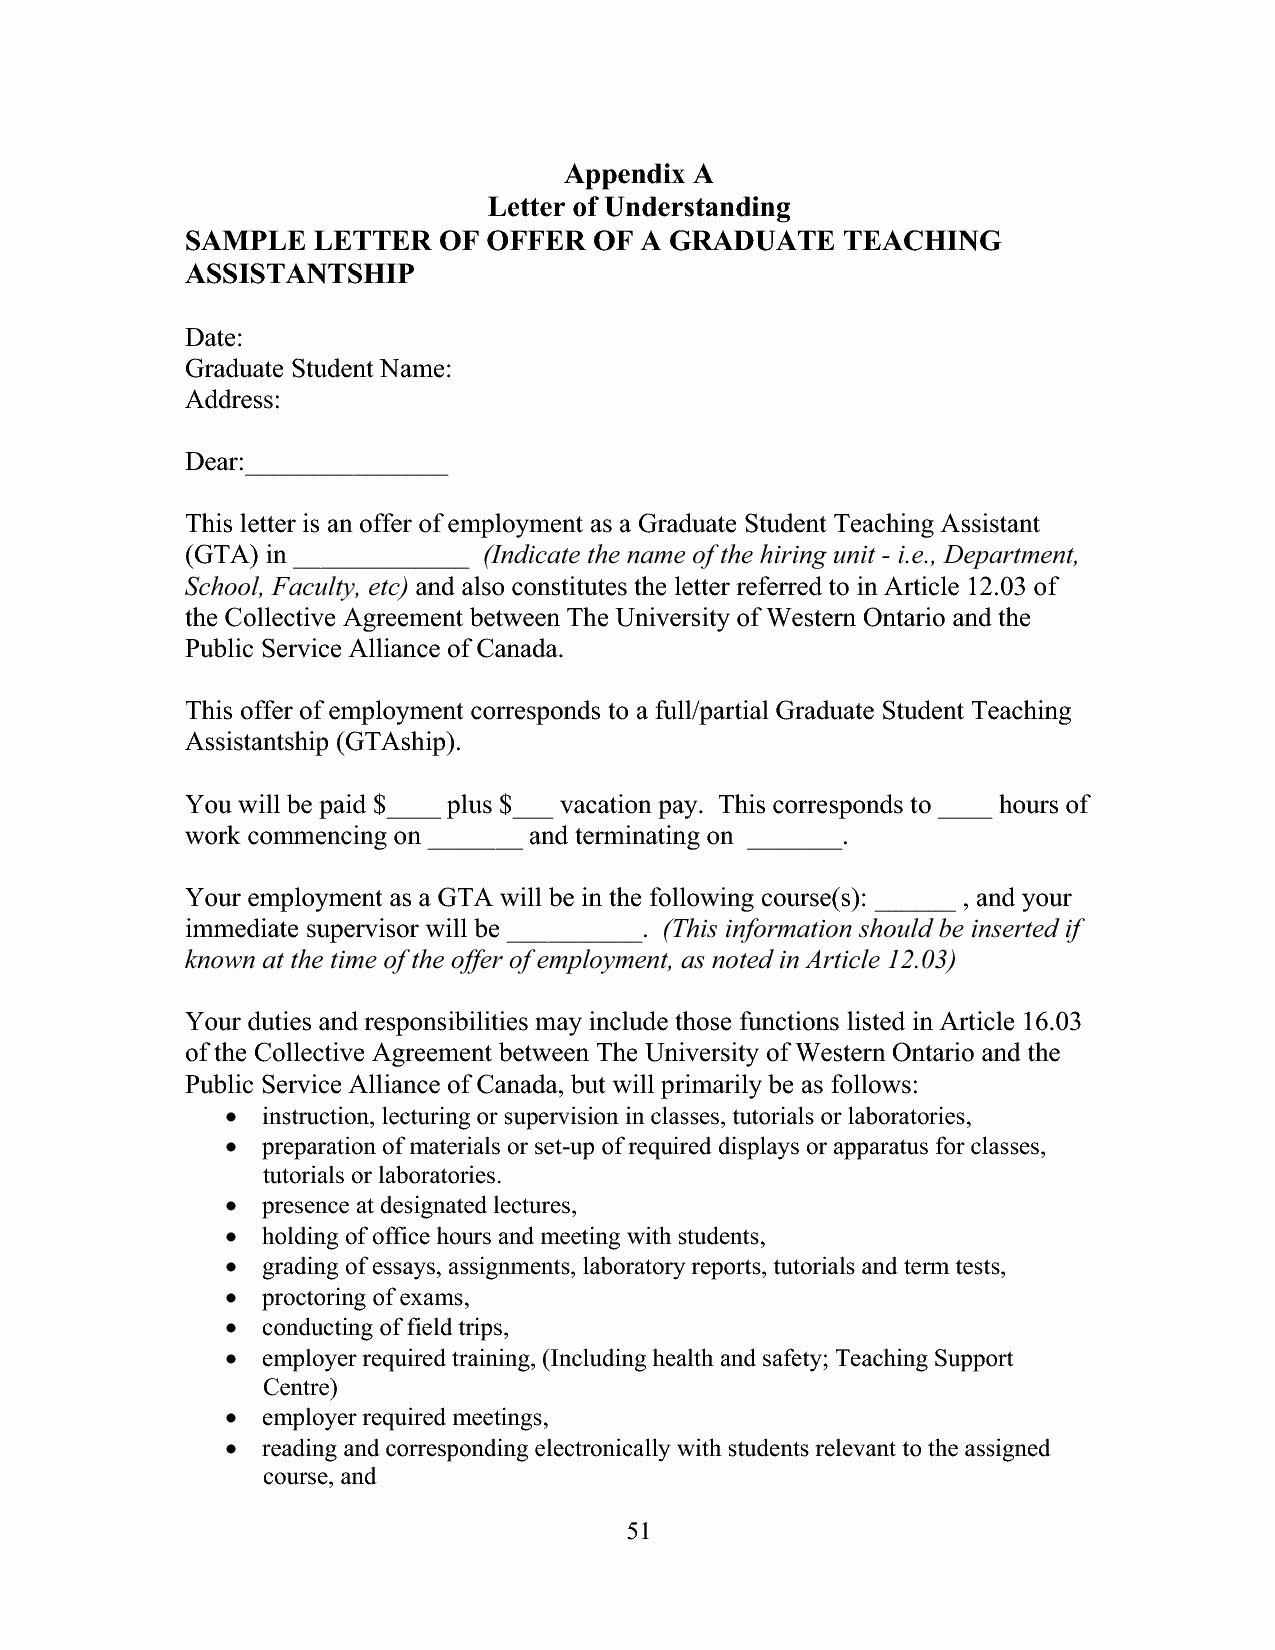 10 Best Of Va Letter Agreement and Understanding